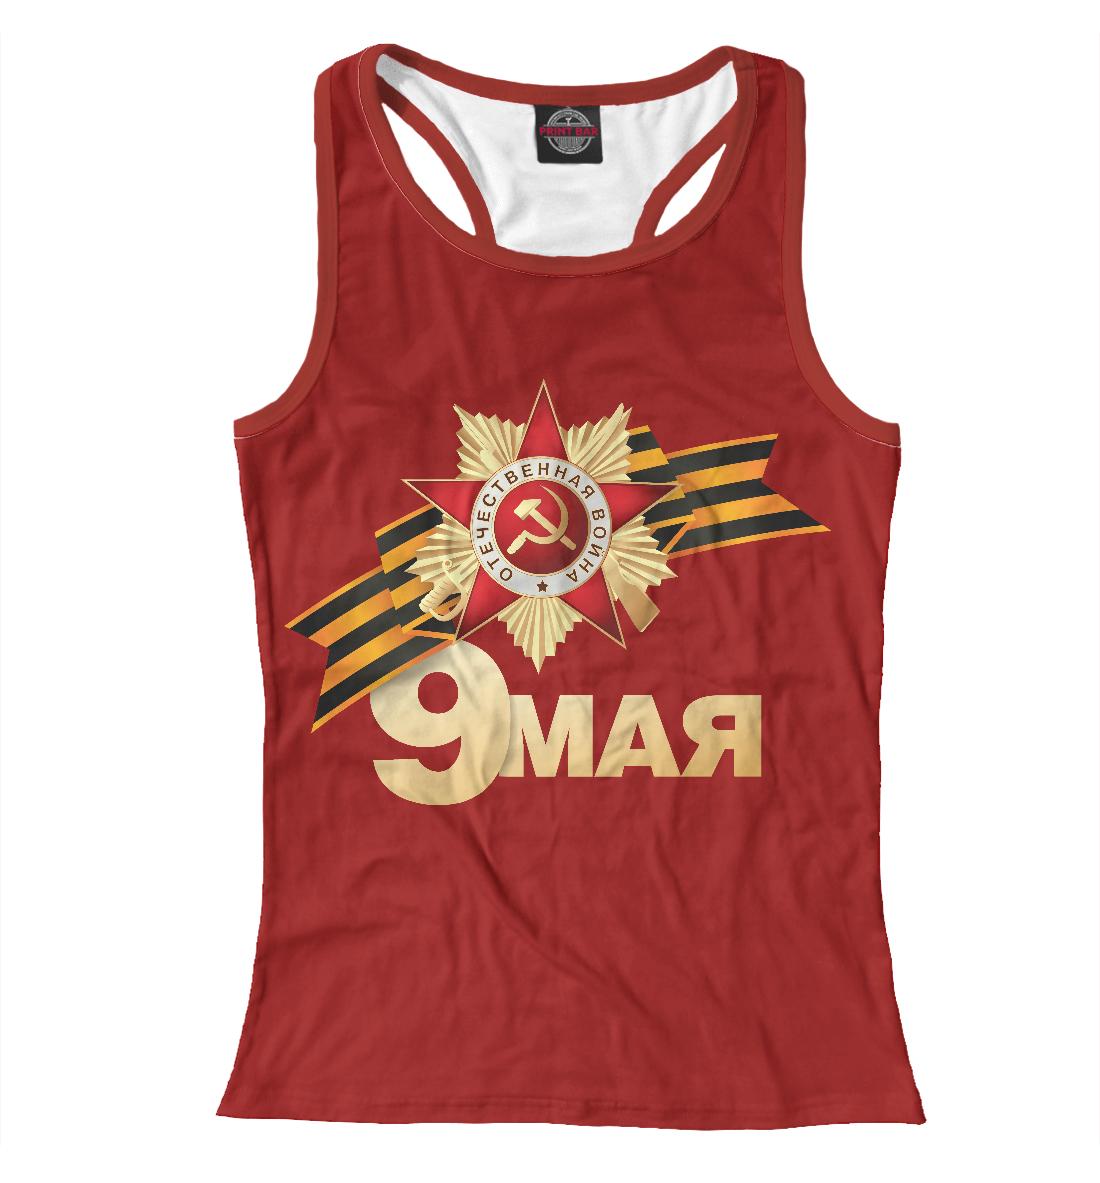 Купить 9 Мая, Printbar, Майки борцовки, 9MA-538793-mayb-1